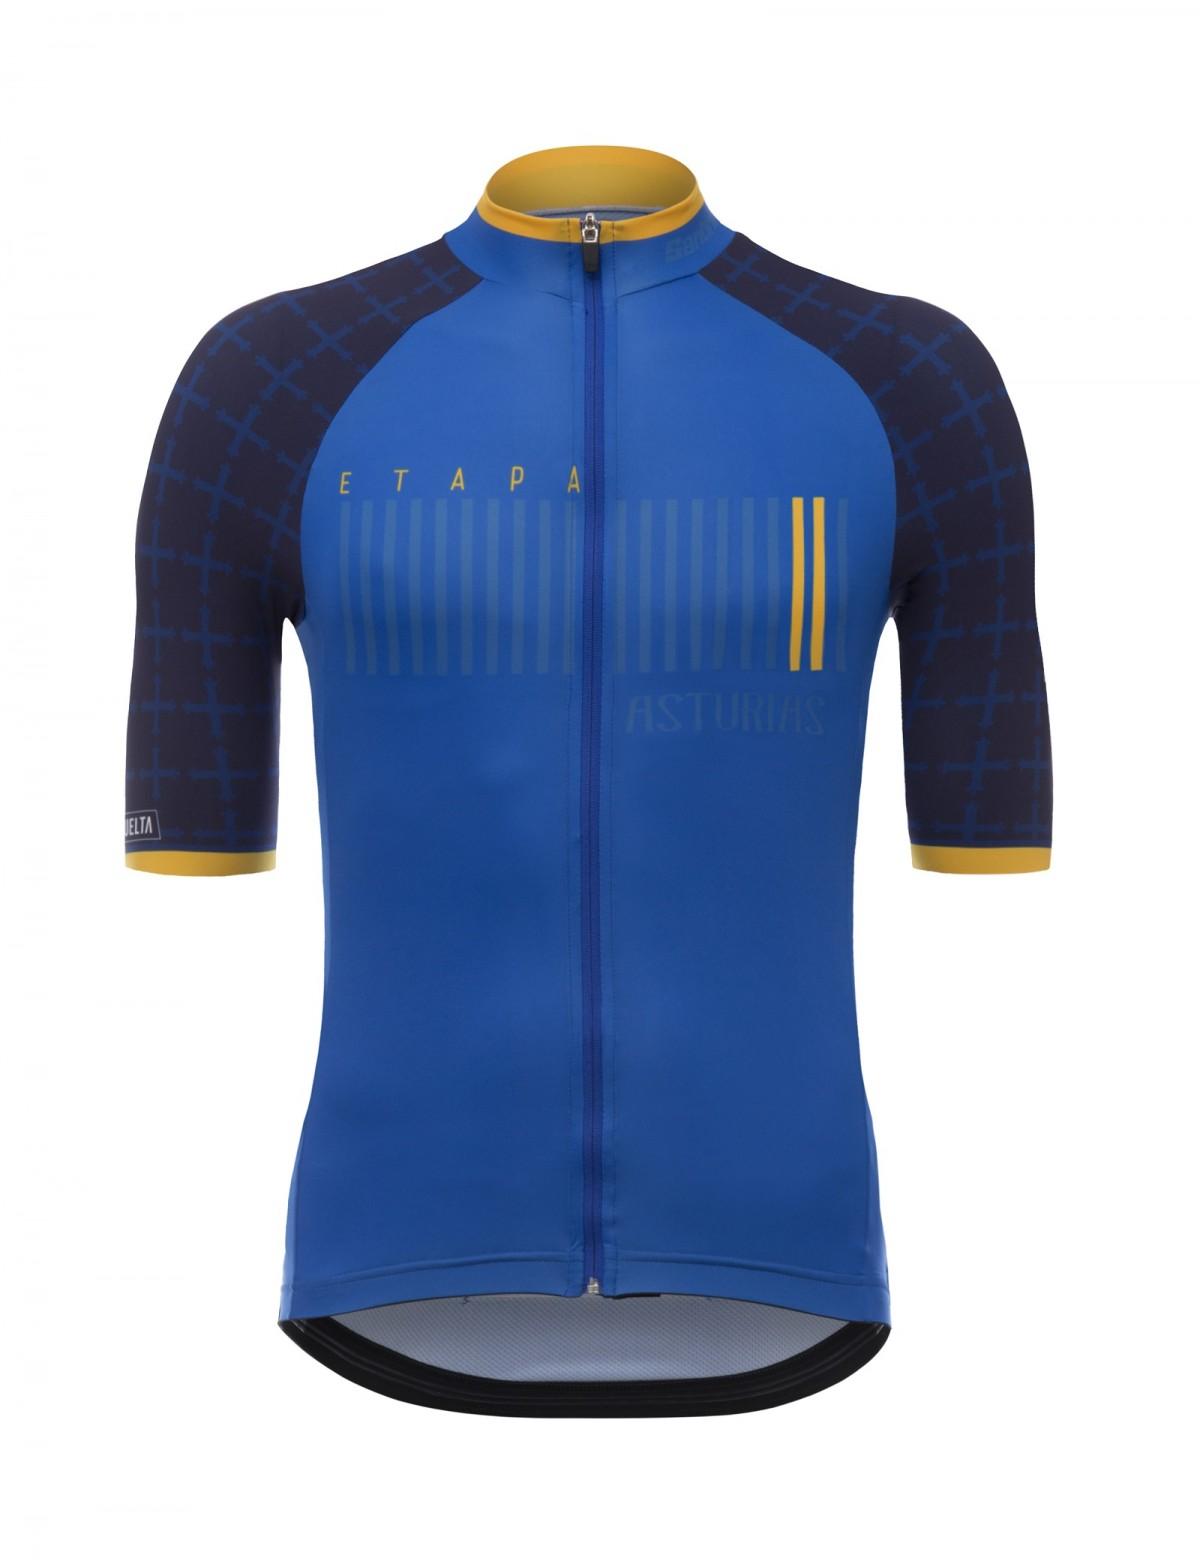 Vuelta maglia Asturias